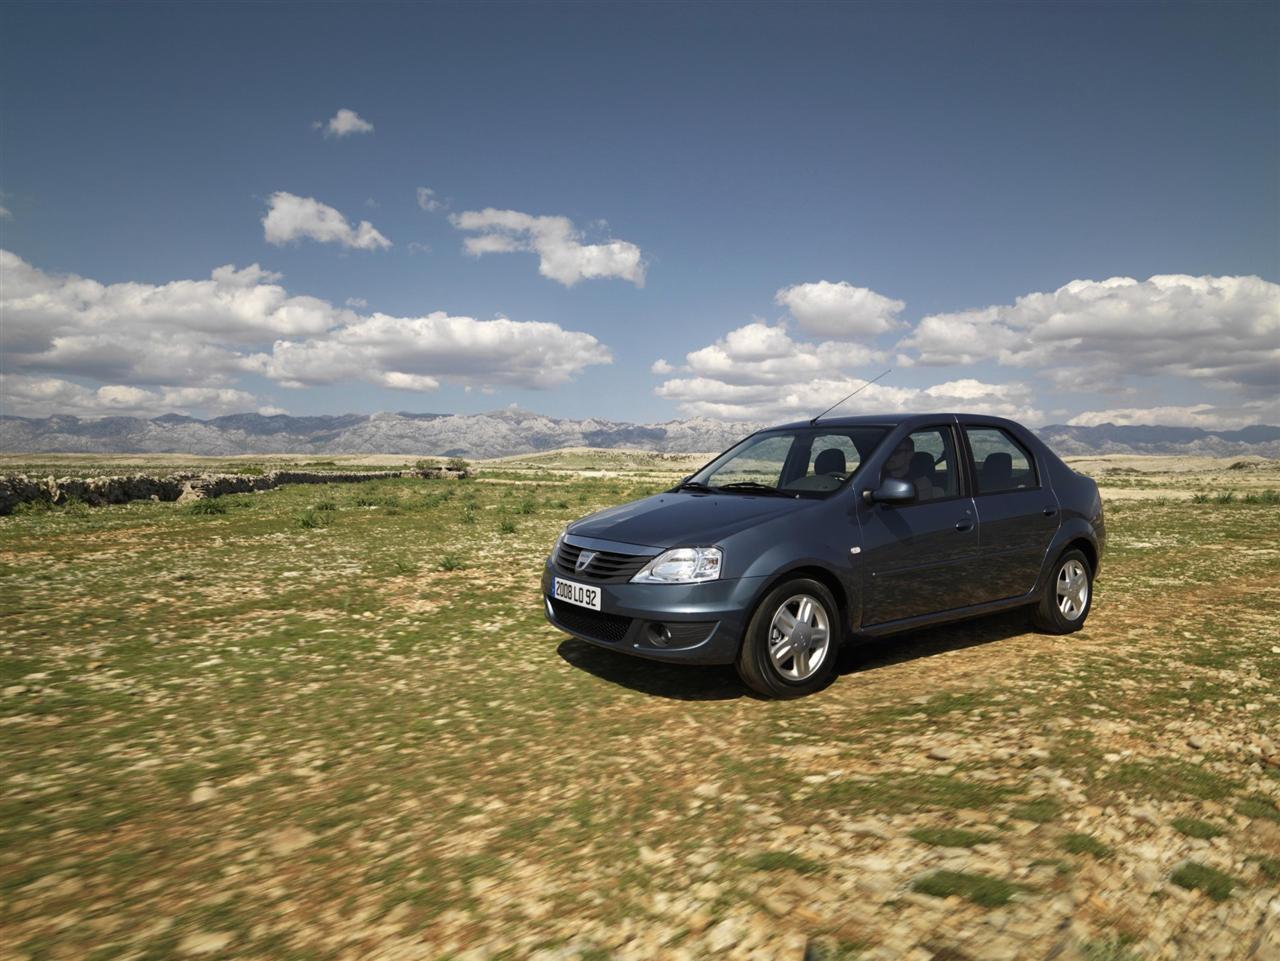 2009 Dacia Logan Image